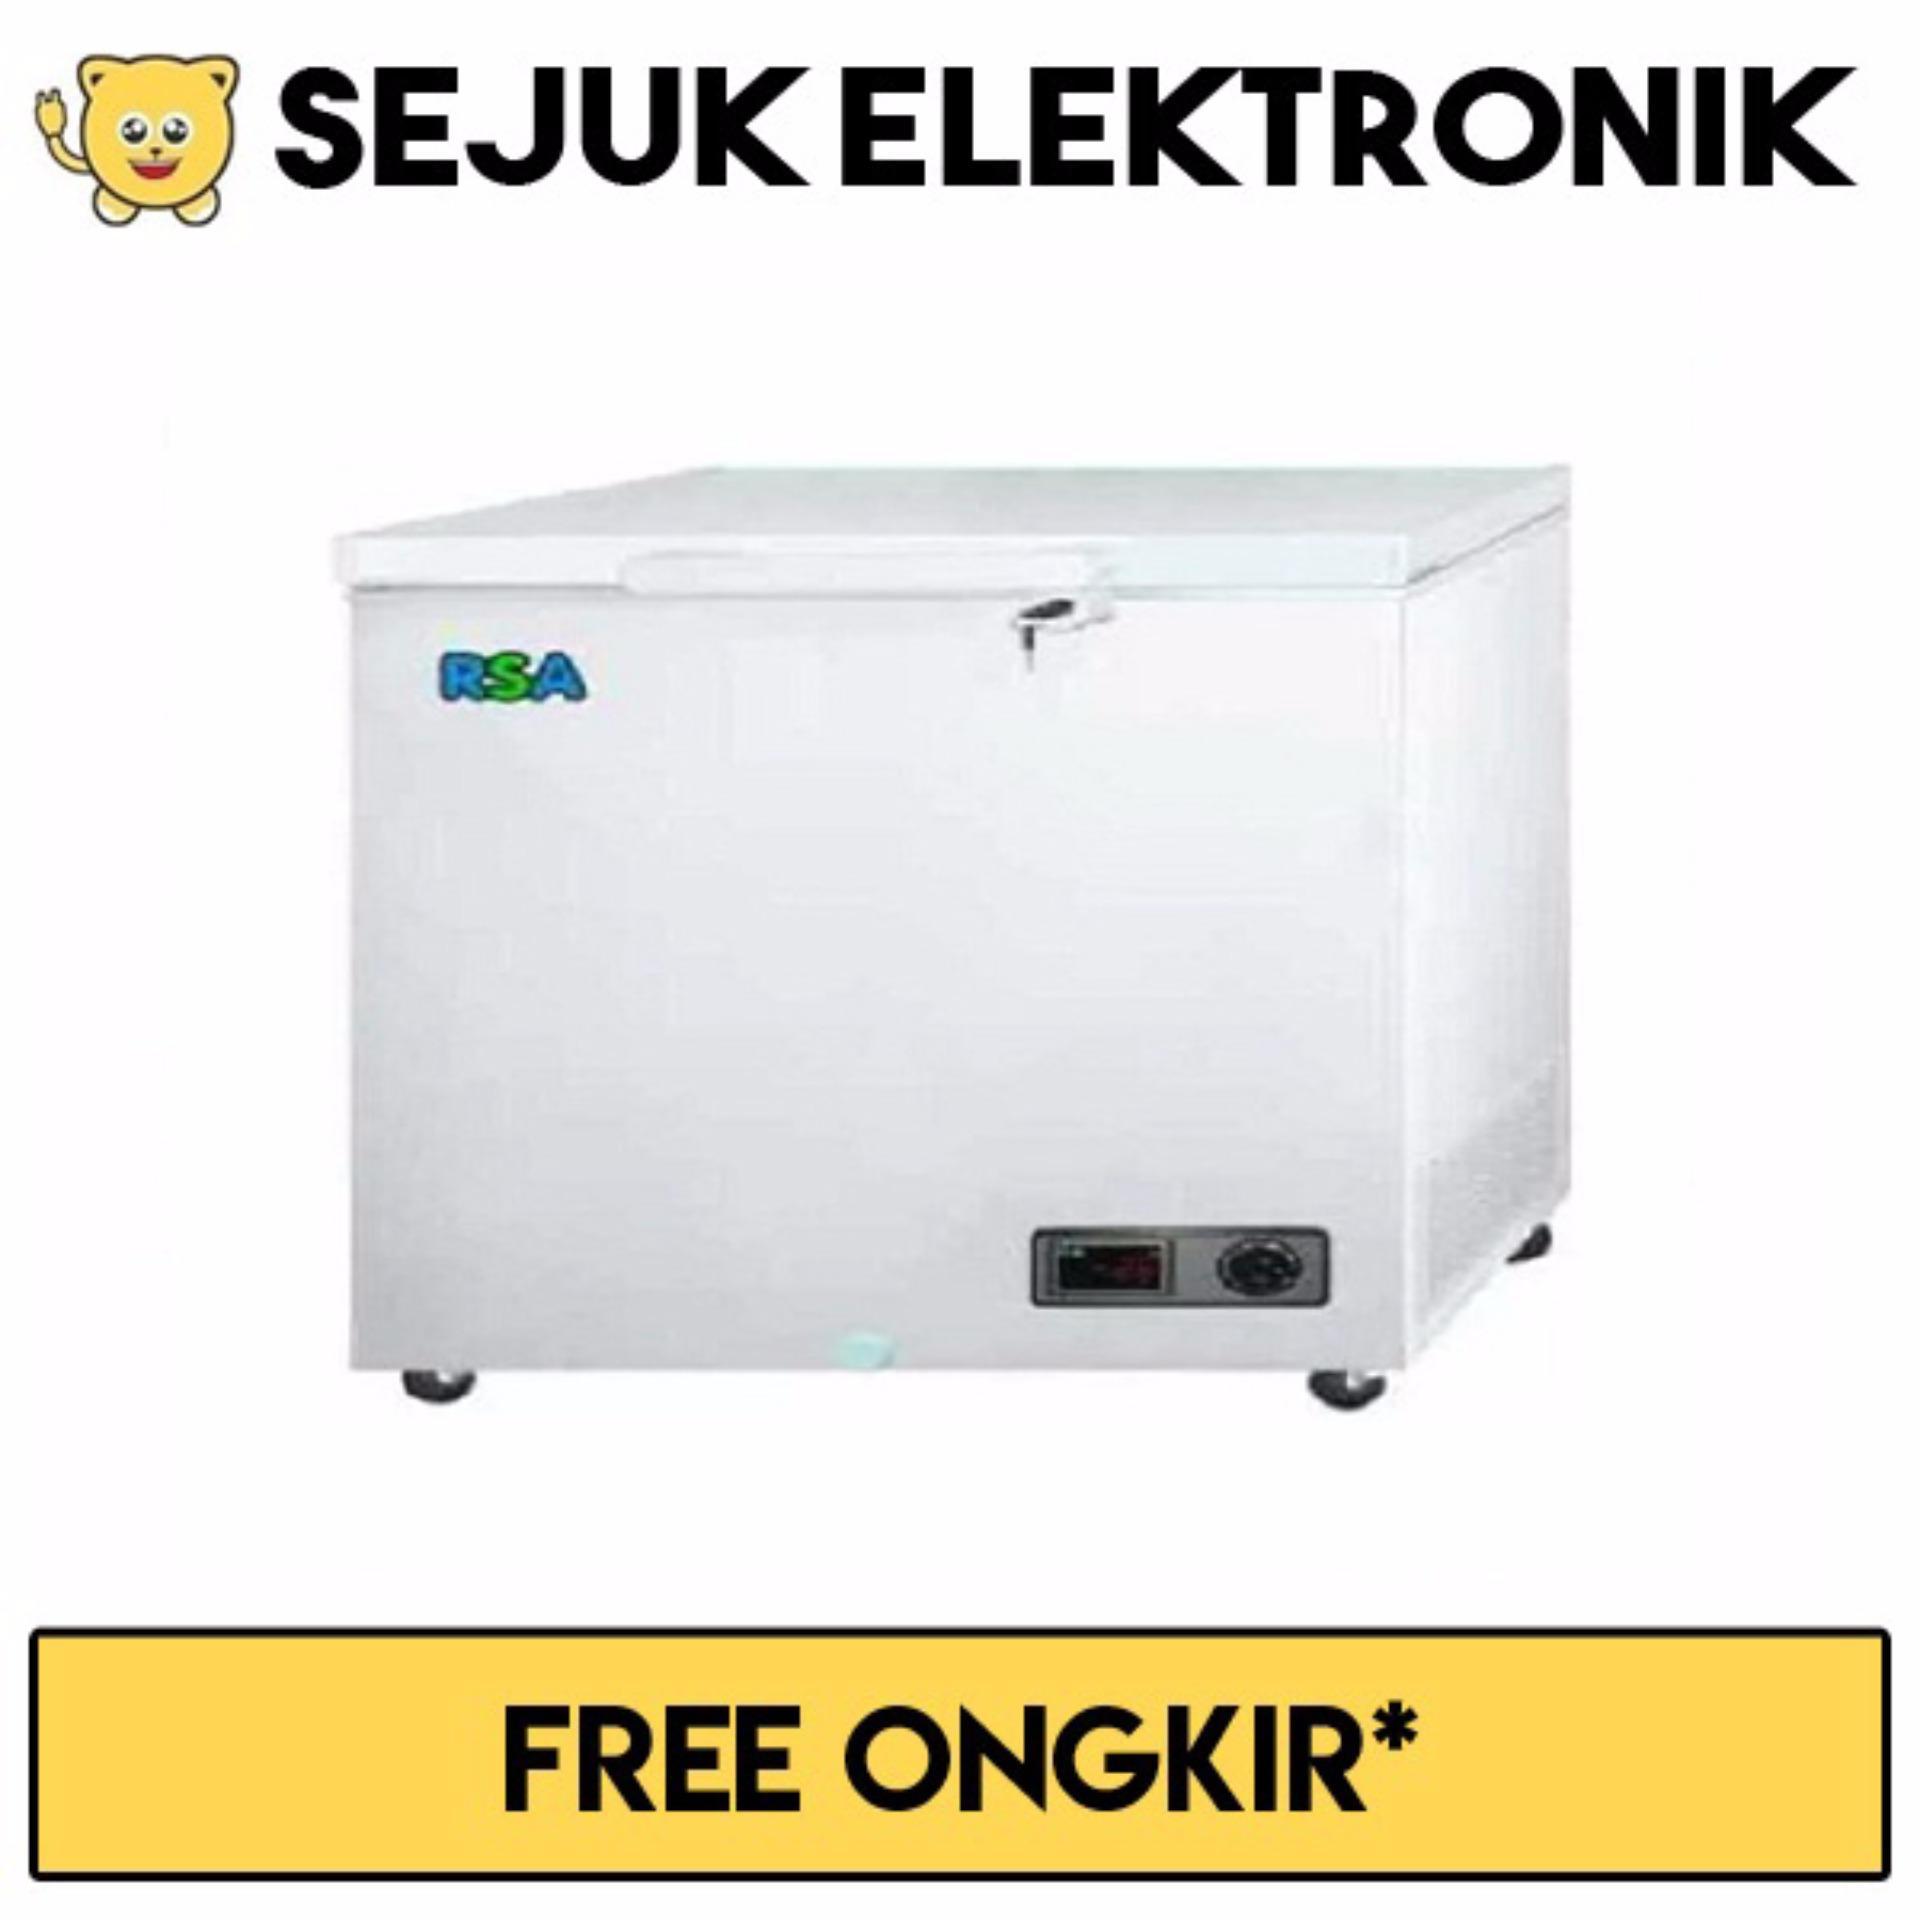 Beli Rsa Cf 220 Chest Freezer 220 Liter Putih Khusus Jadetabek Rsa Murah